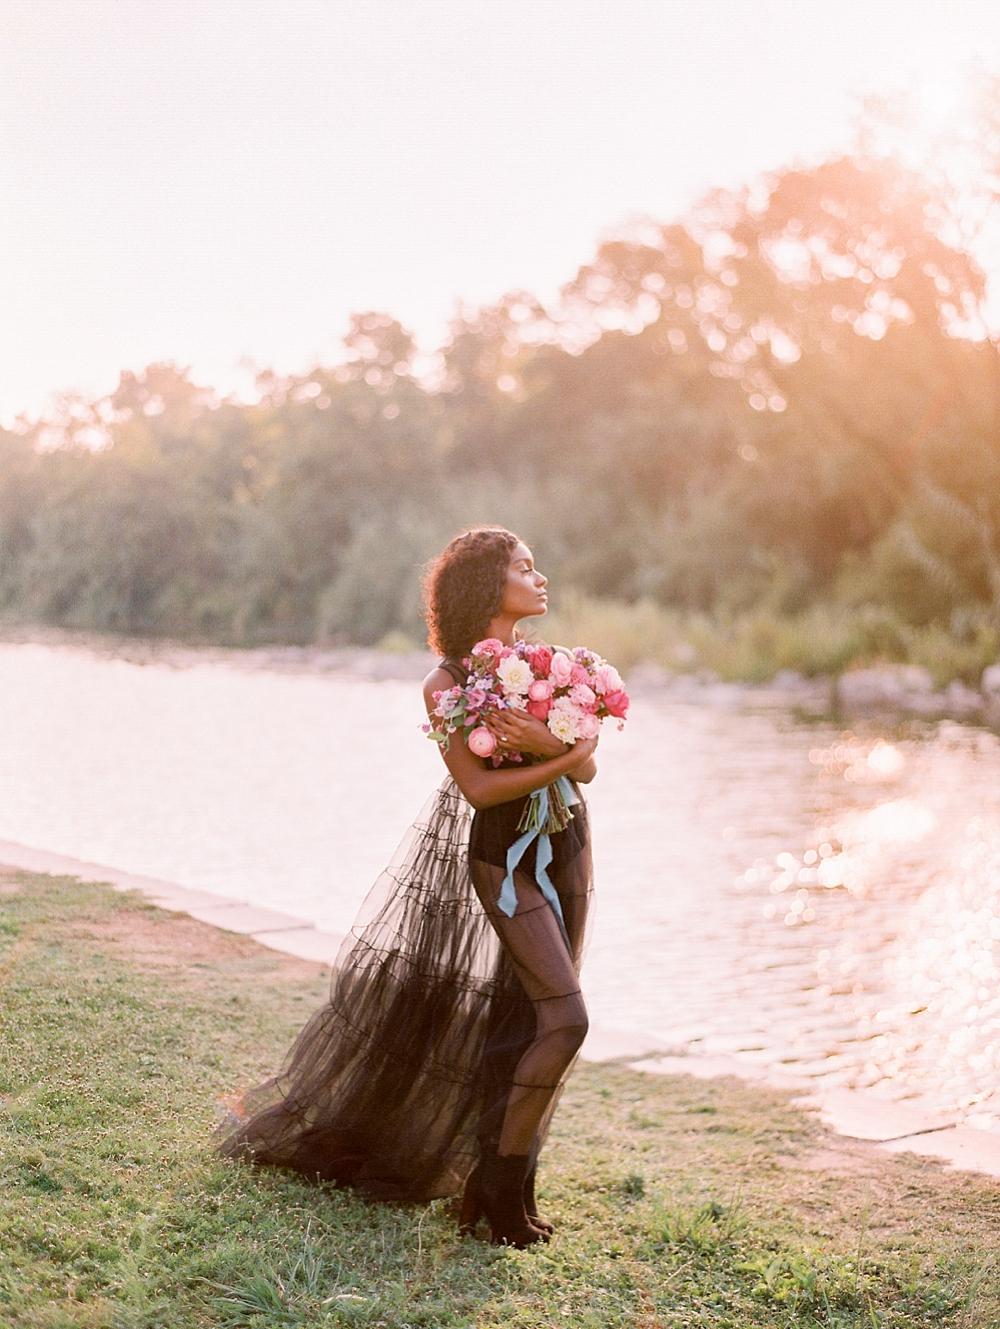 kristin-la-voie-photography-AUSTIN-wedding-BOUDOIR-photographer-81